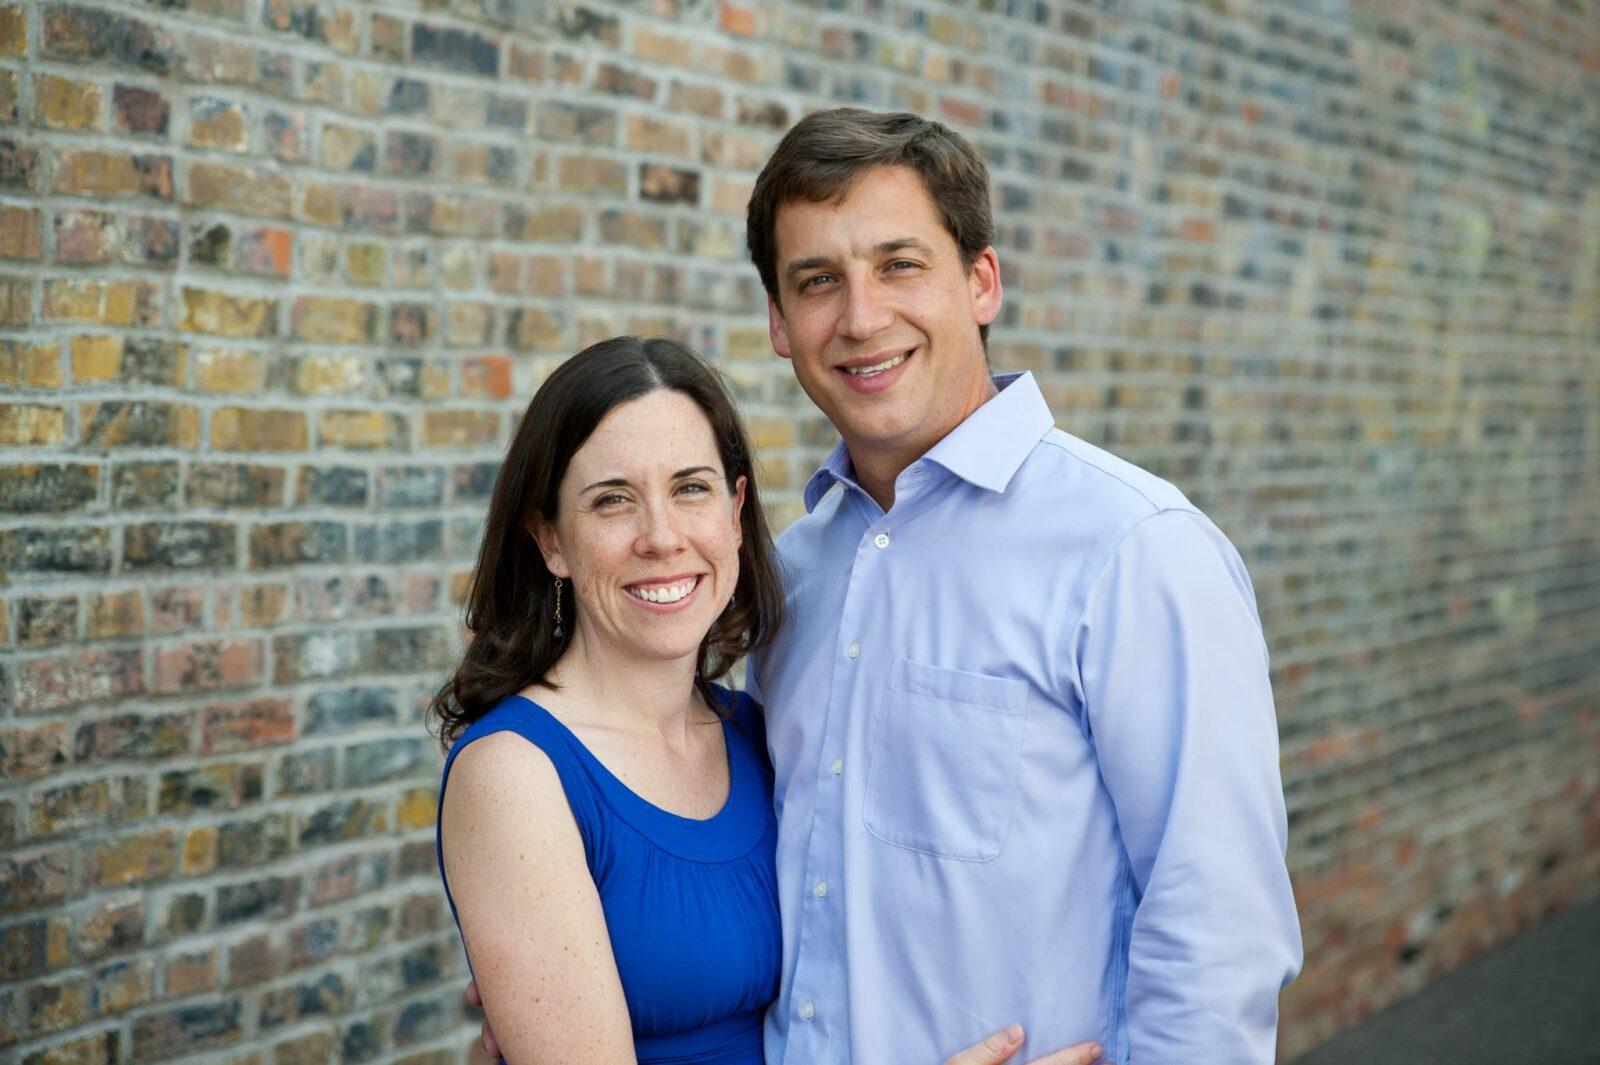 Laura Kelly Fanucci + Franco David Fanucci